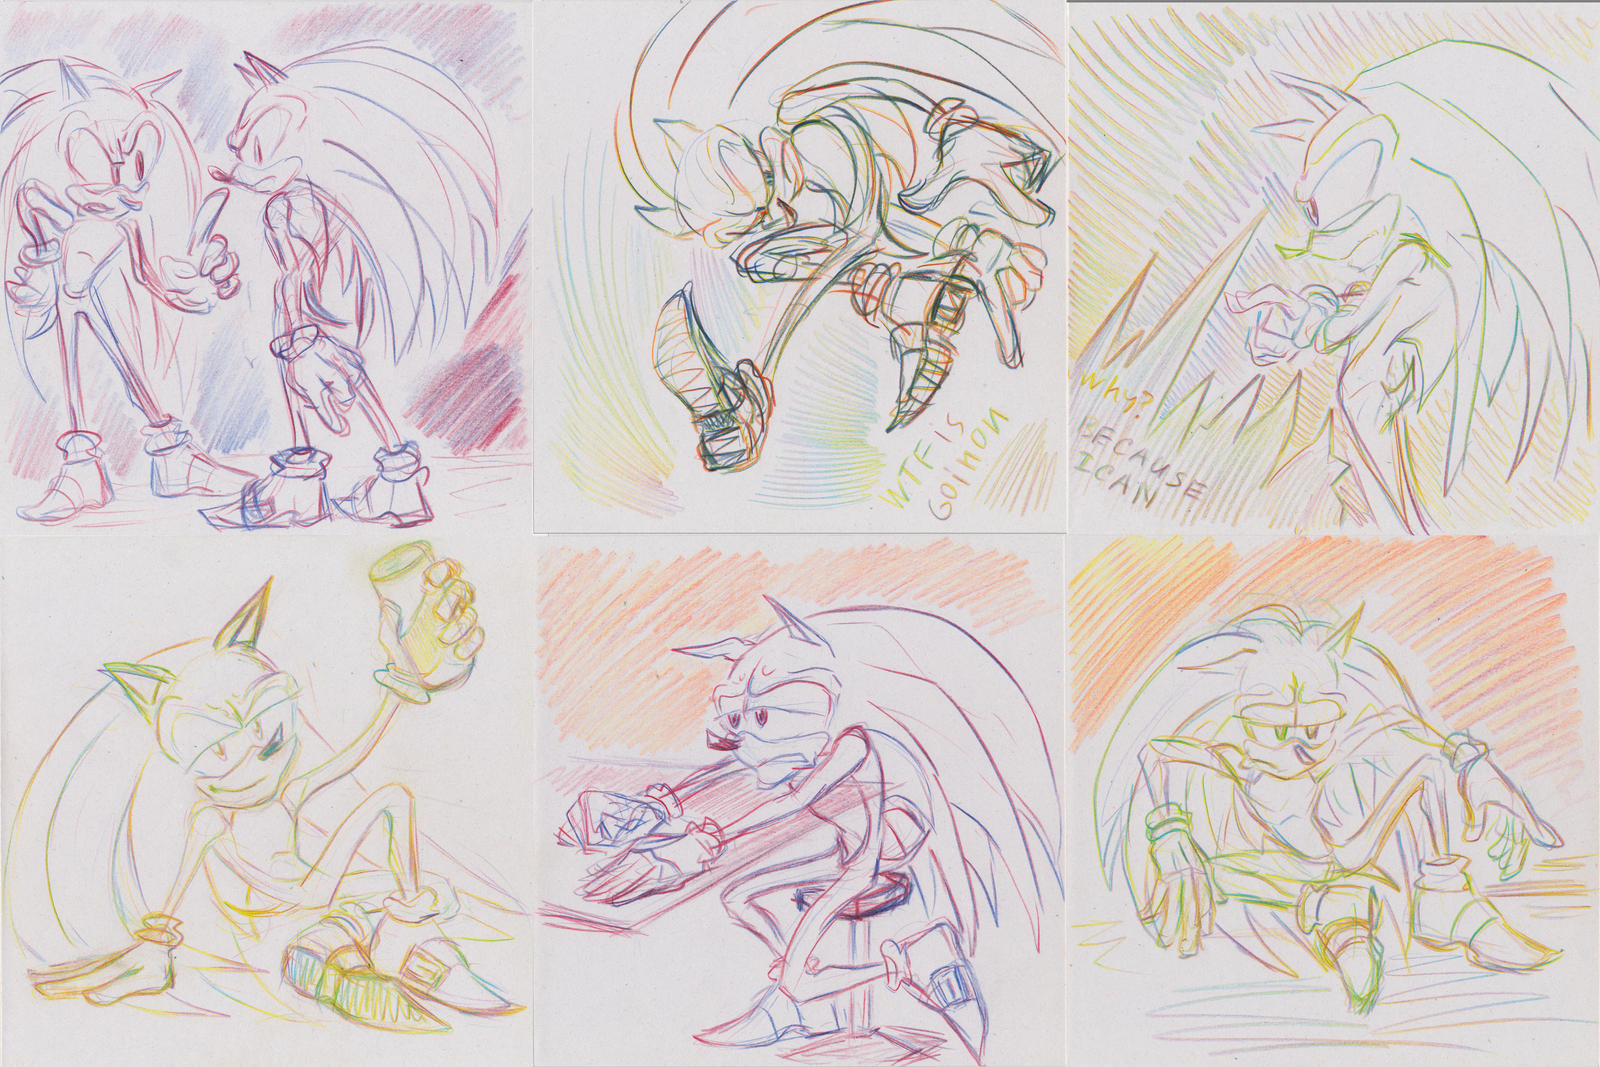 Sanic Sketches 3